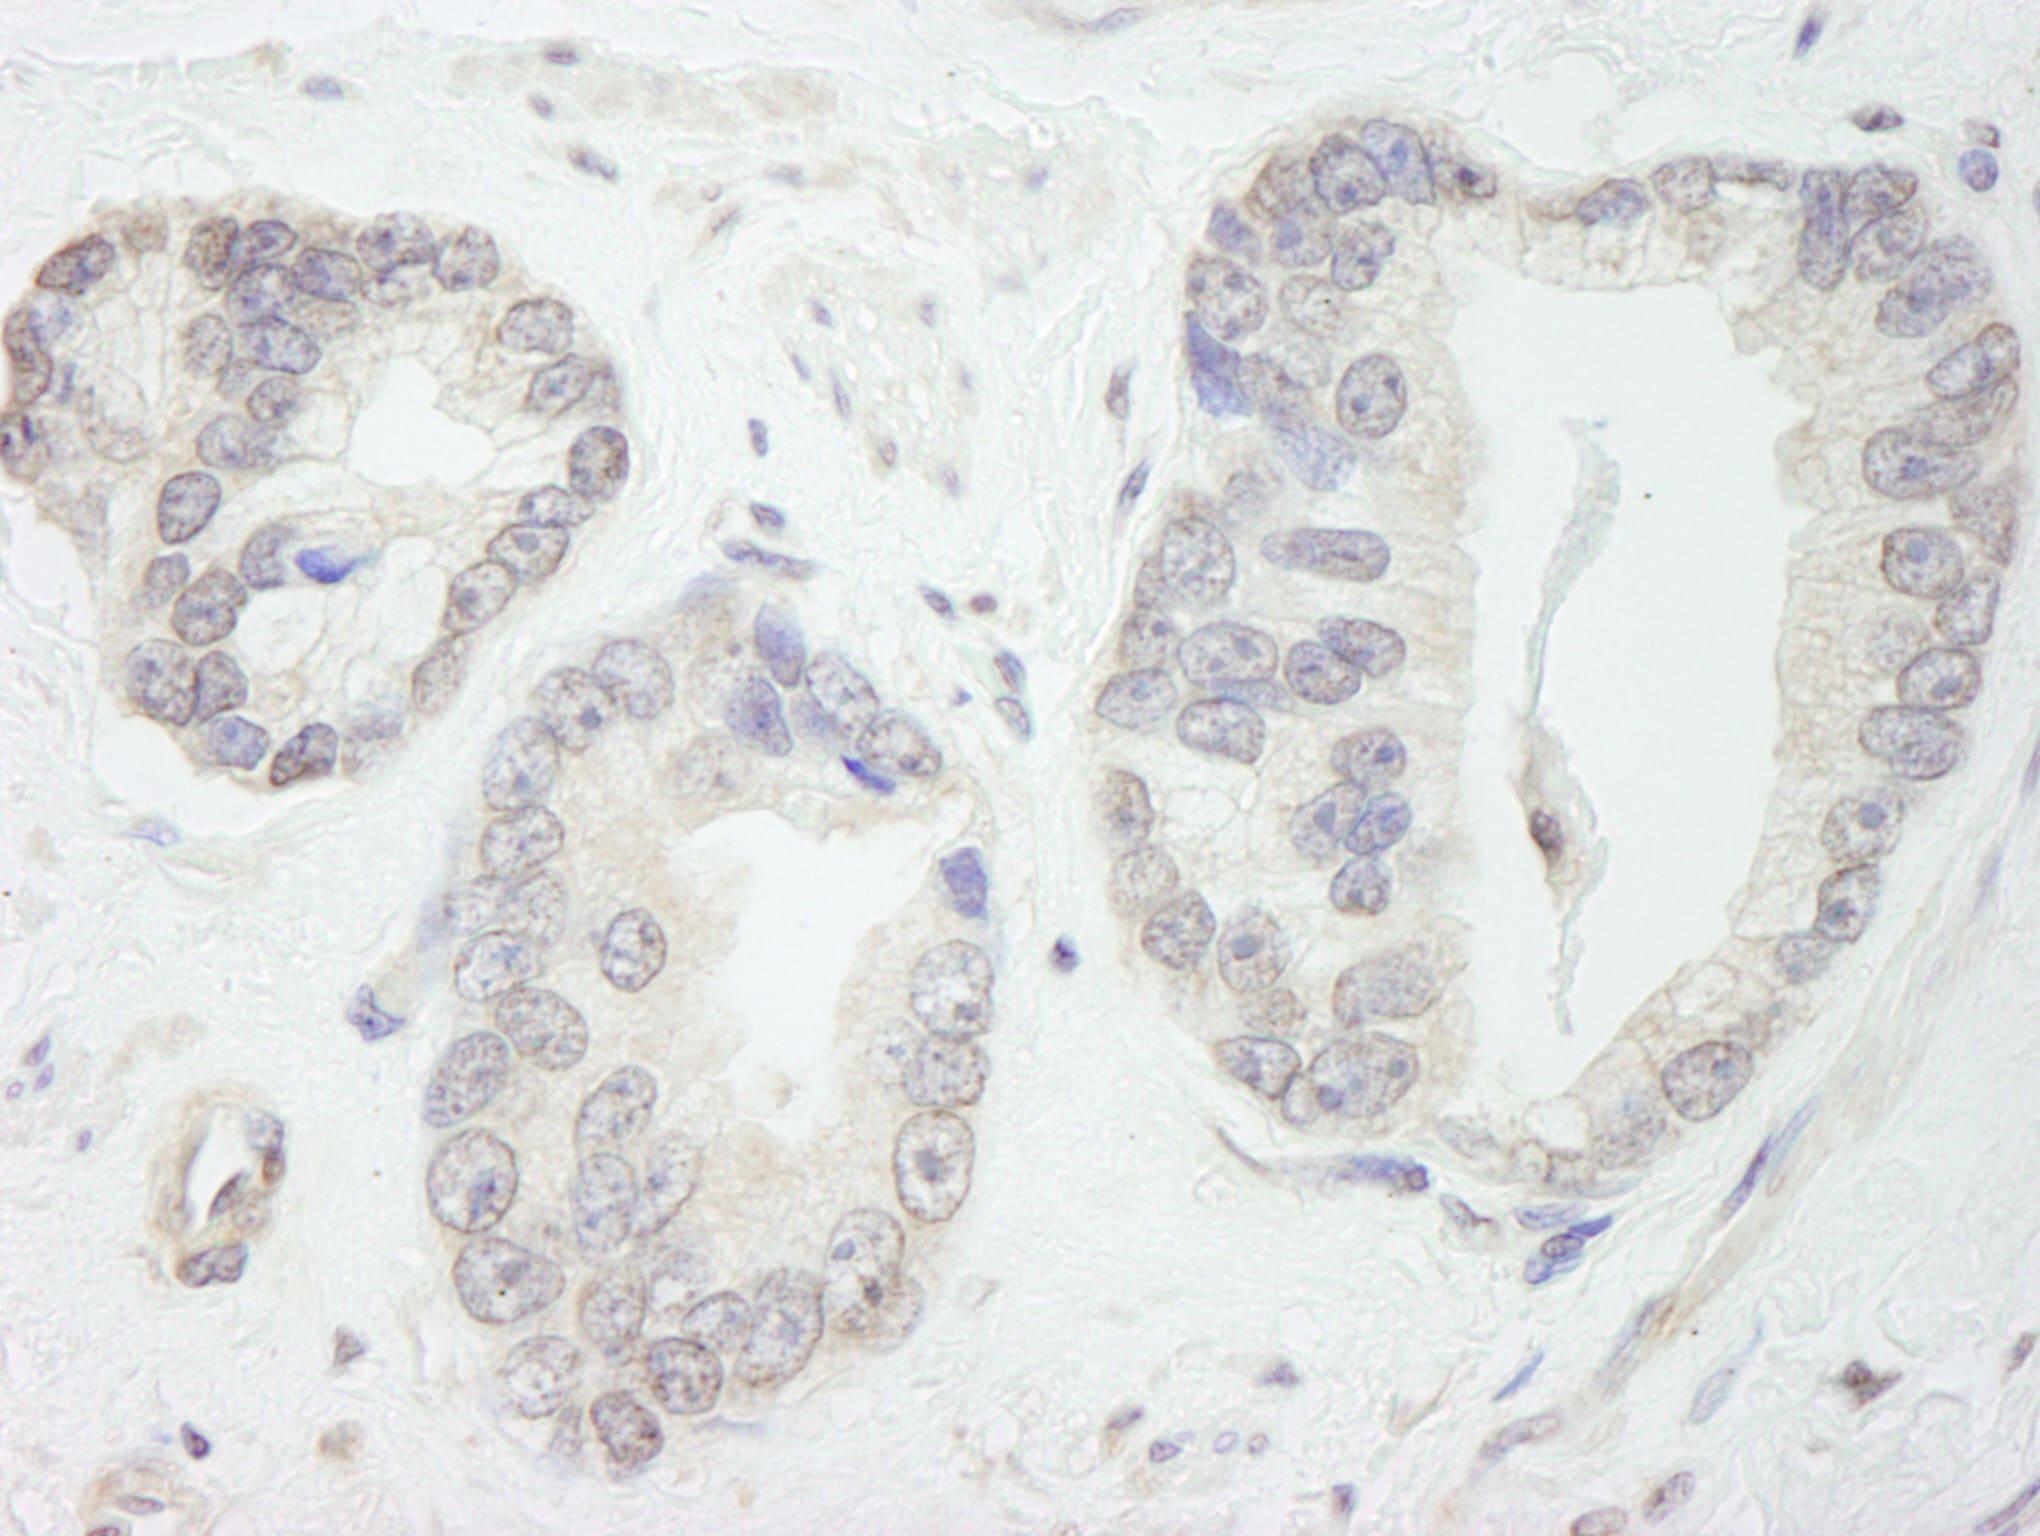 GTF3C1/TFIIIC220 Antibody in Immunohistochemistry (IHC)